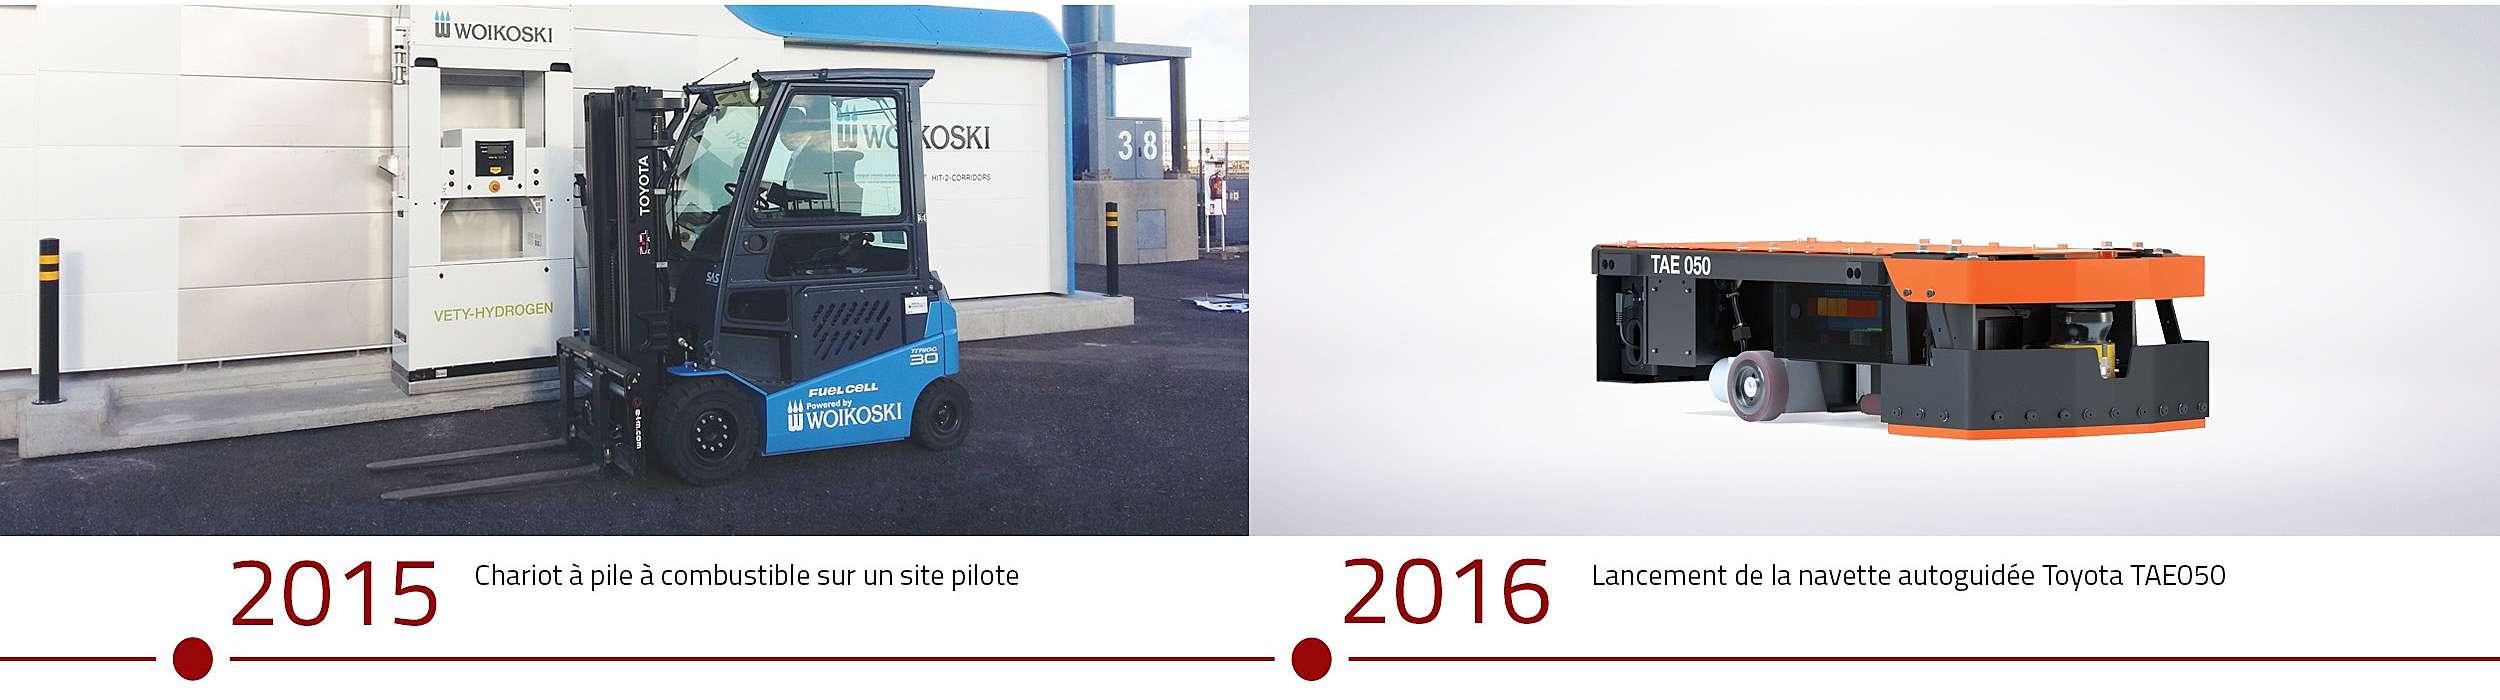 Histoire Toyota Material Handling